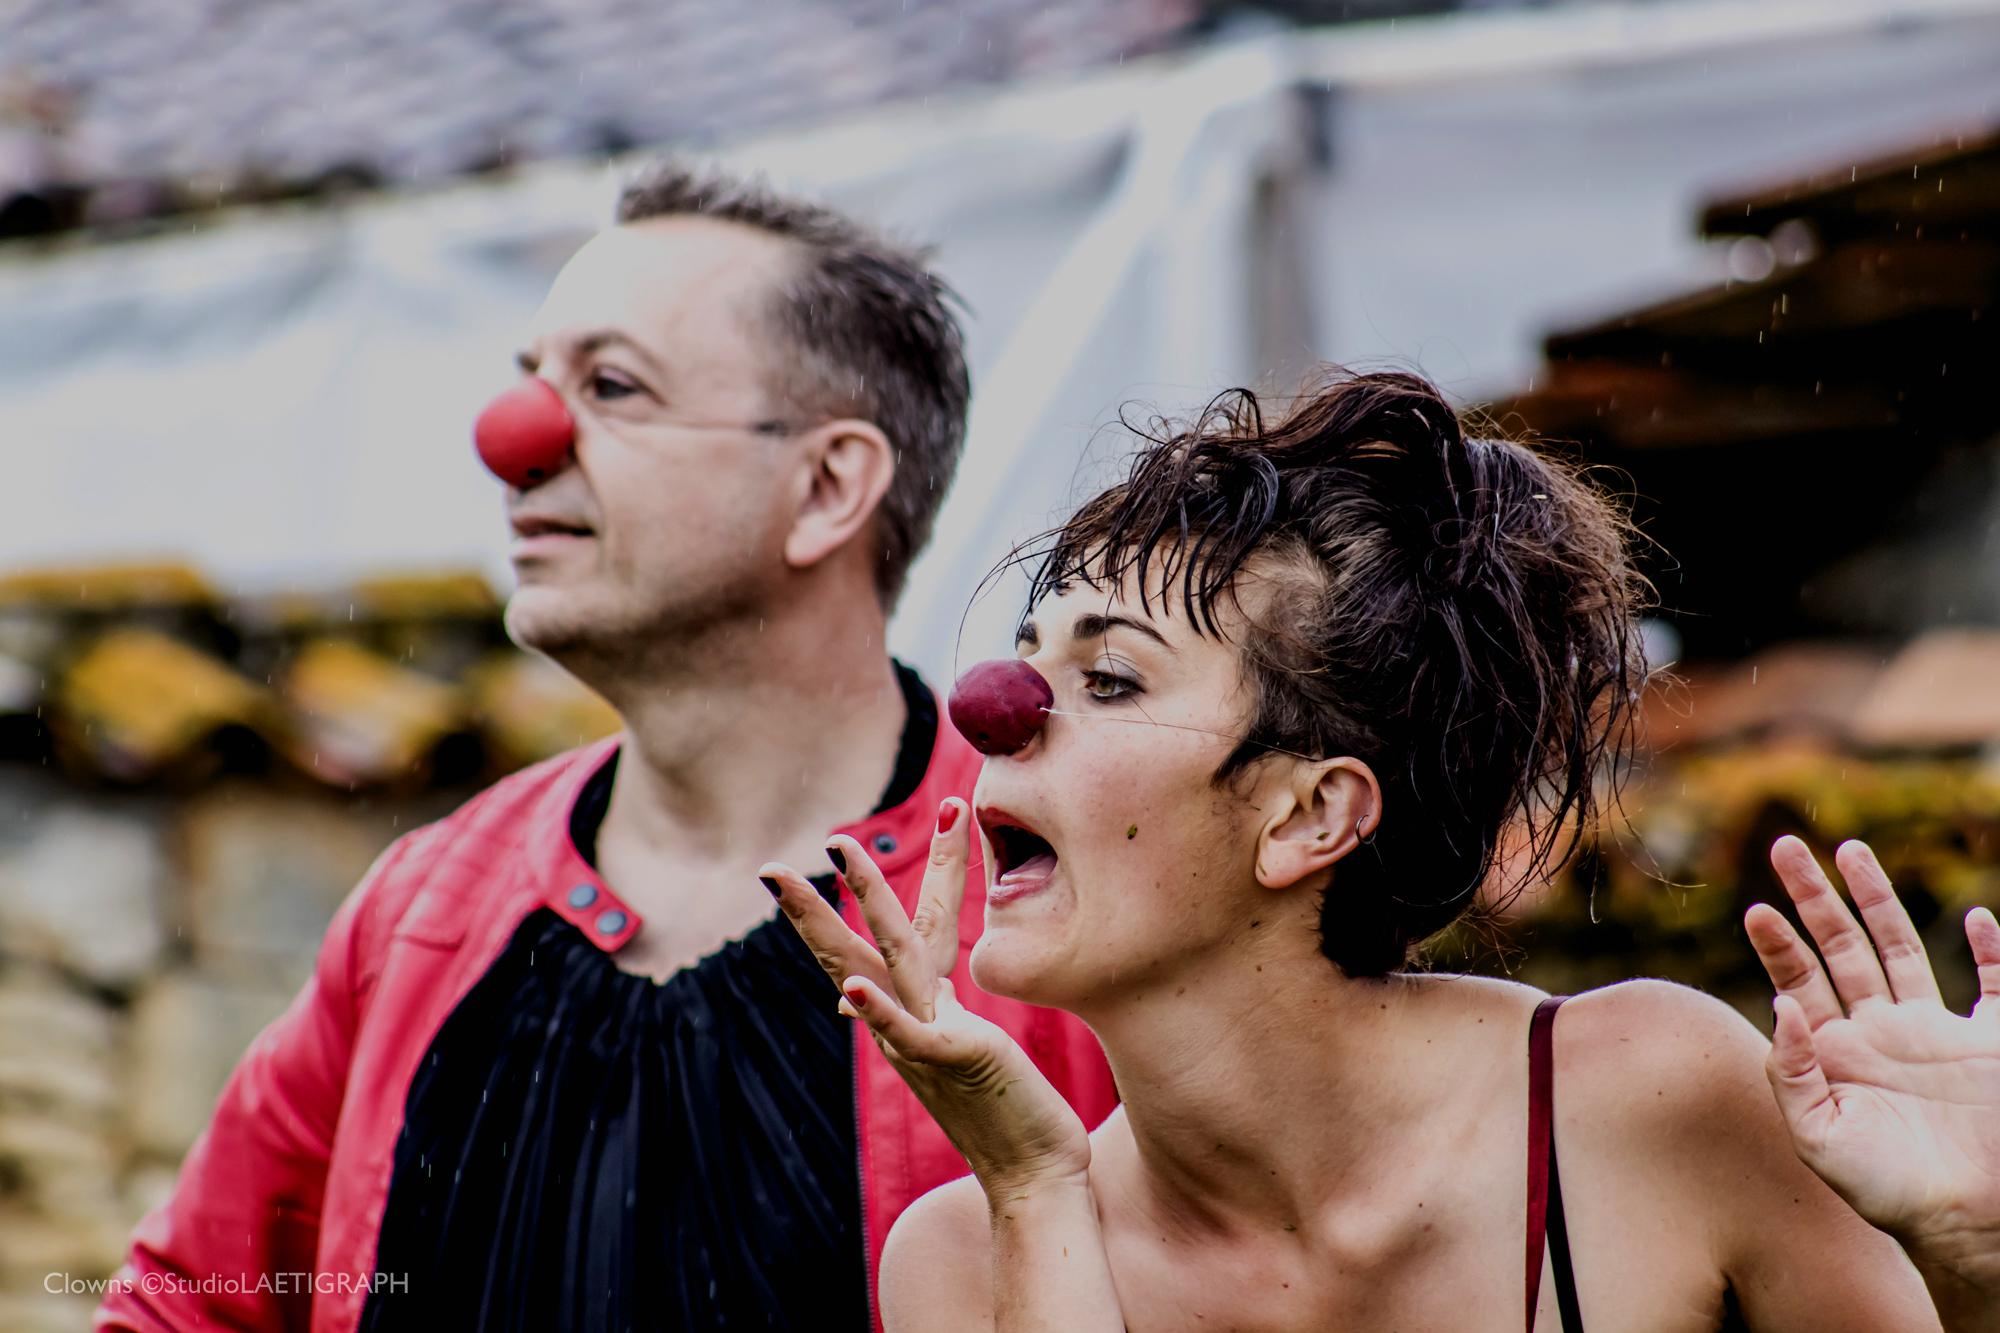 LMDCB21_clowns-88_1